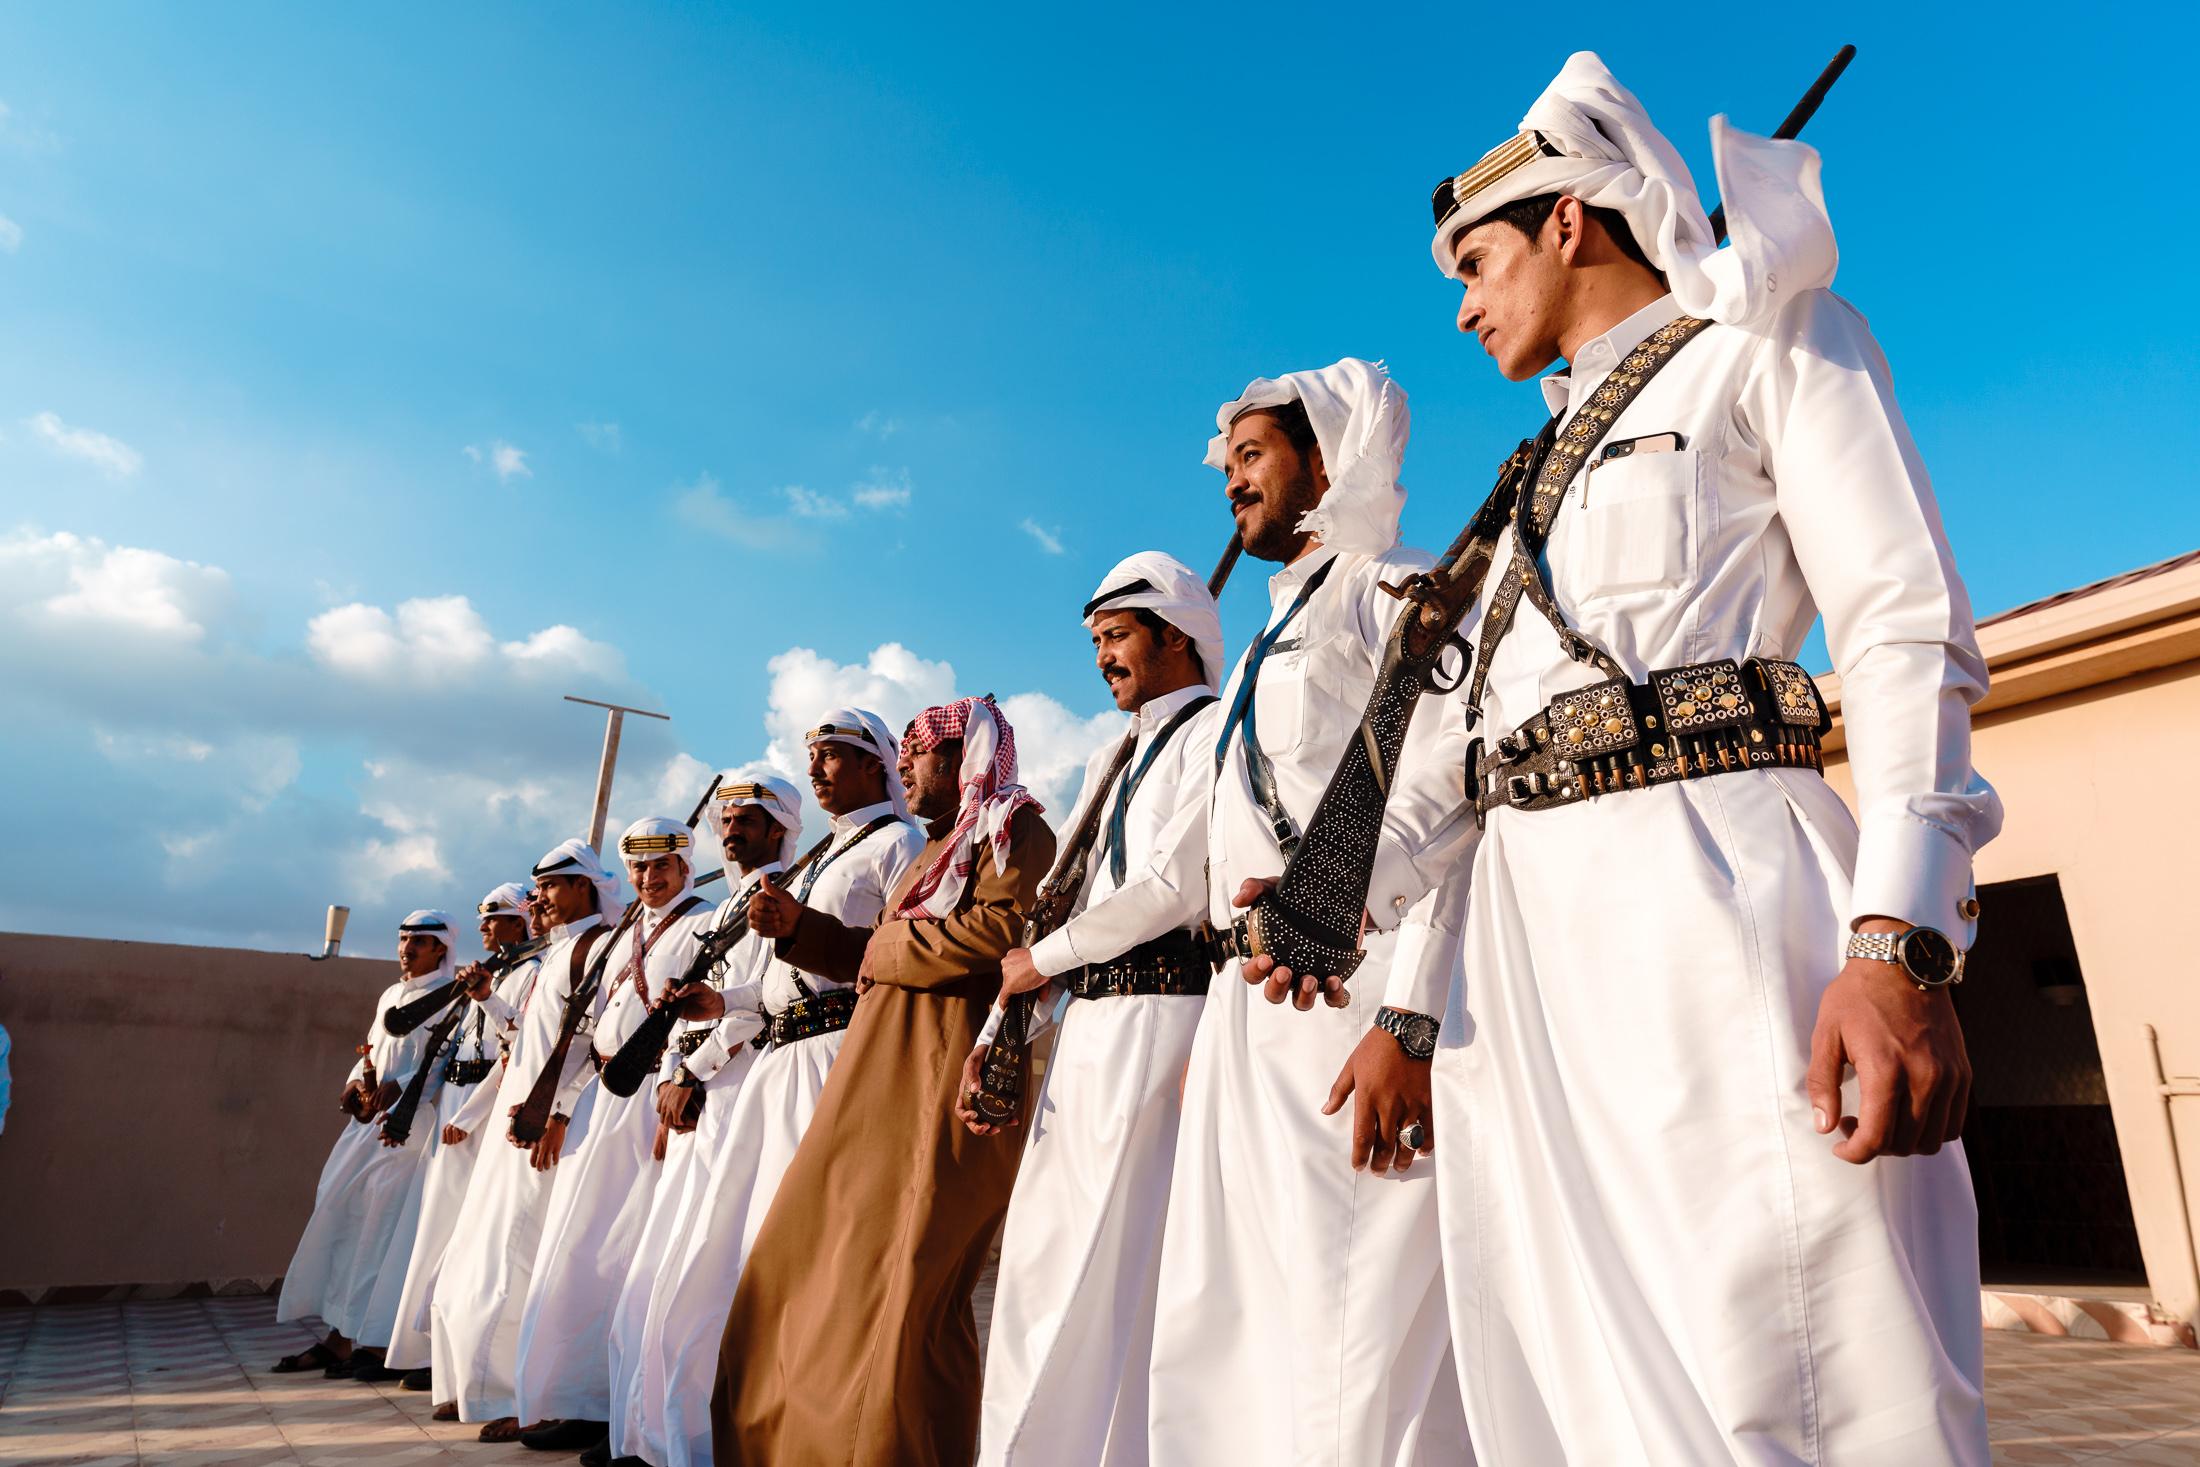 2019.03.28_Tamashee Al Taif Experience_5868_2200px.jpg